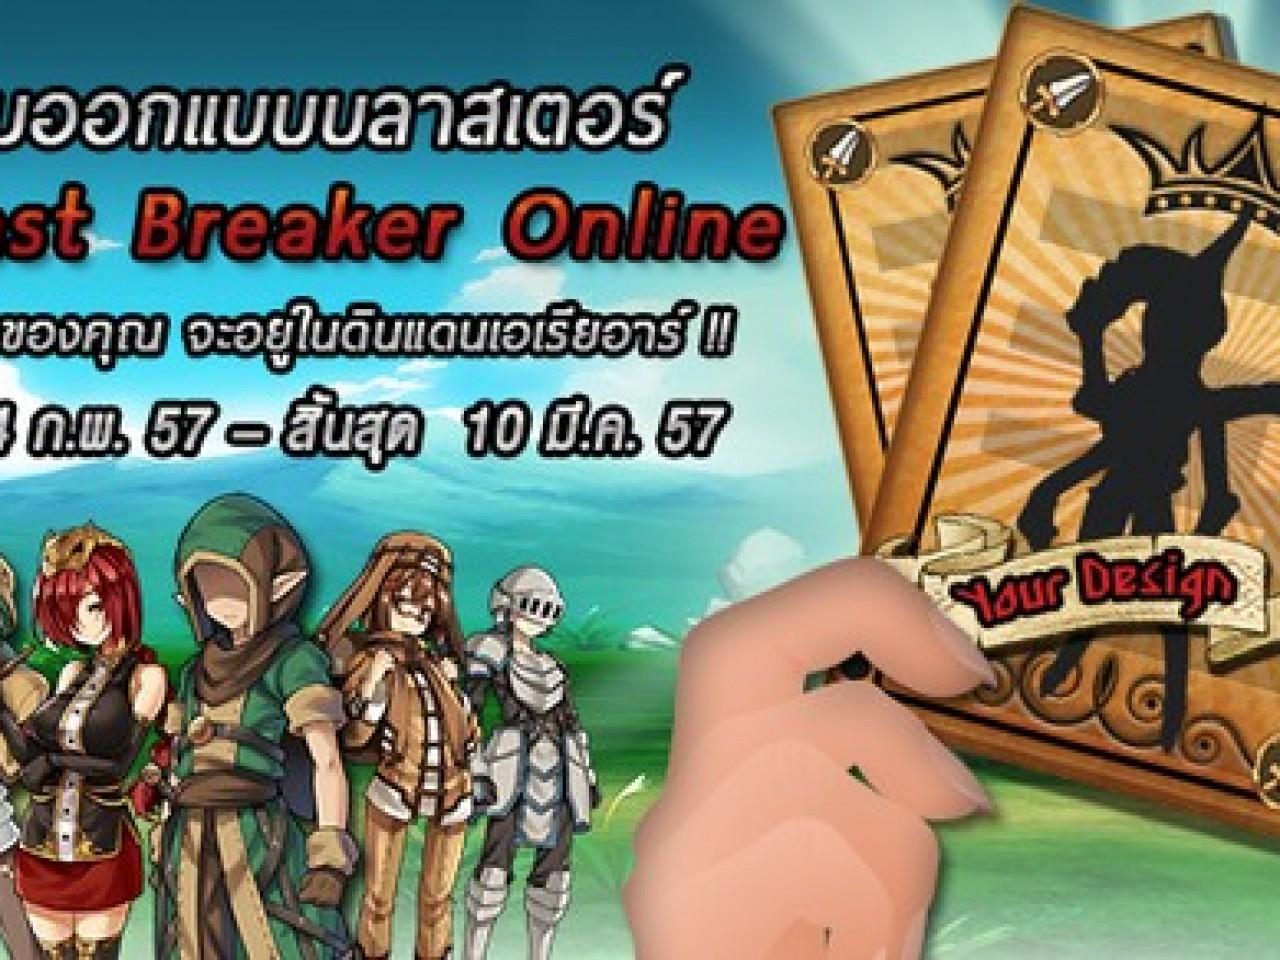 Blast Breaker Online ชวนออกแบบบลาสเตอร์ชิงเงินรางวัล